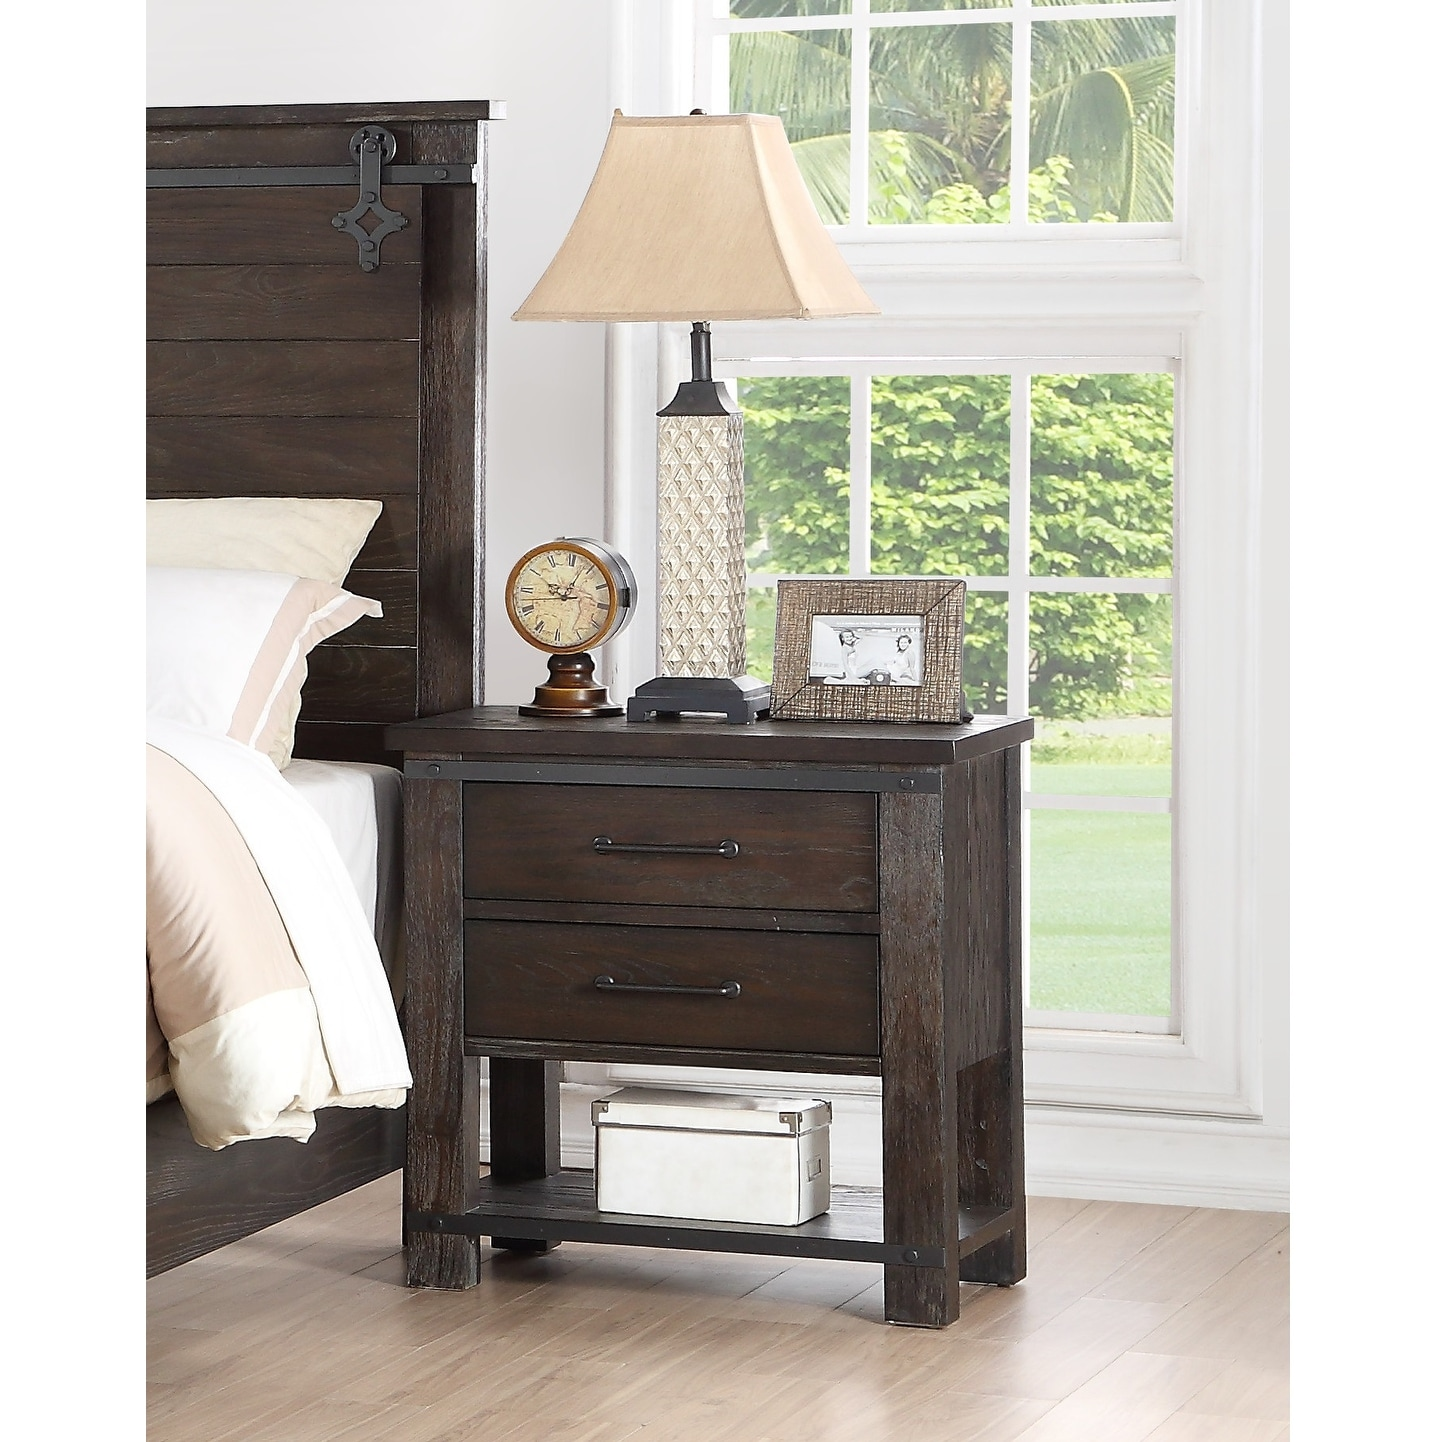 The Gray Barn Chanelle Modern Farmhouse 2 Drawer 1 Shelf Nightstand On Sale Overstock 31701913